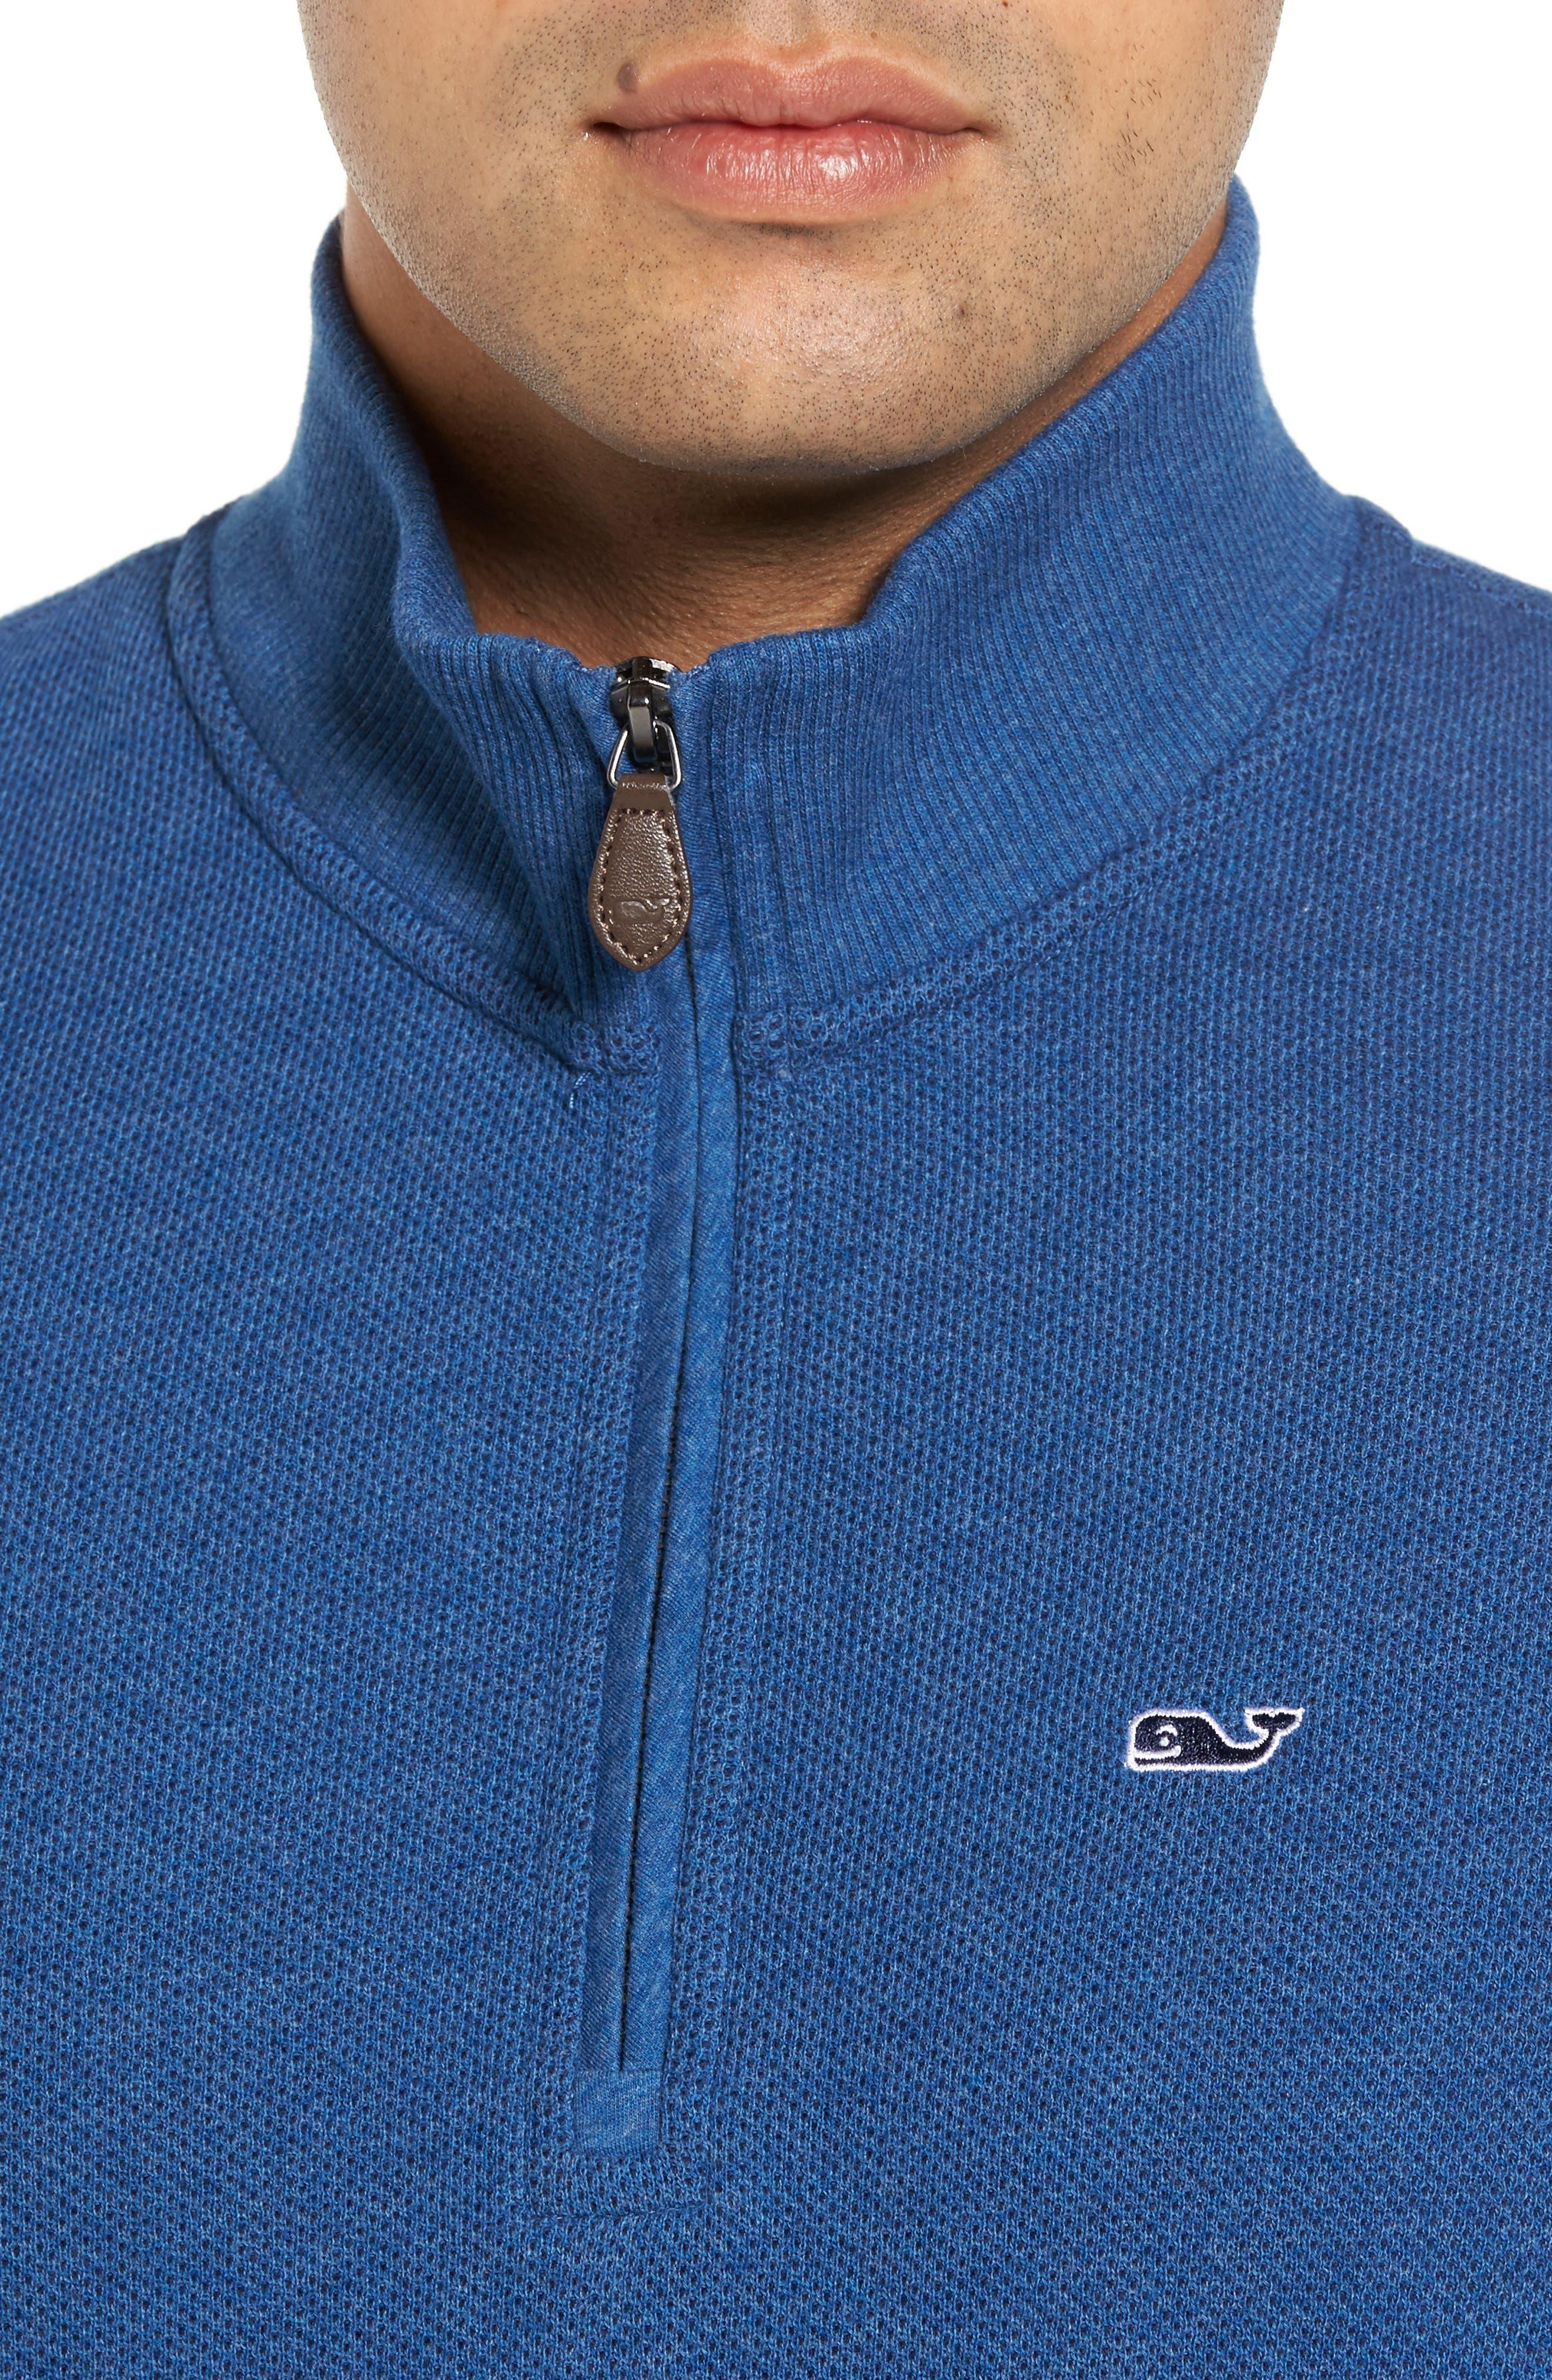 Alternate Image 4  - vineyard vines Double-Knit Quarter Zip Pullover